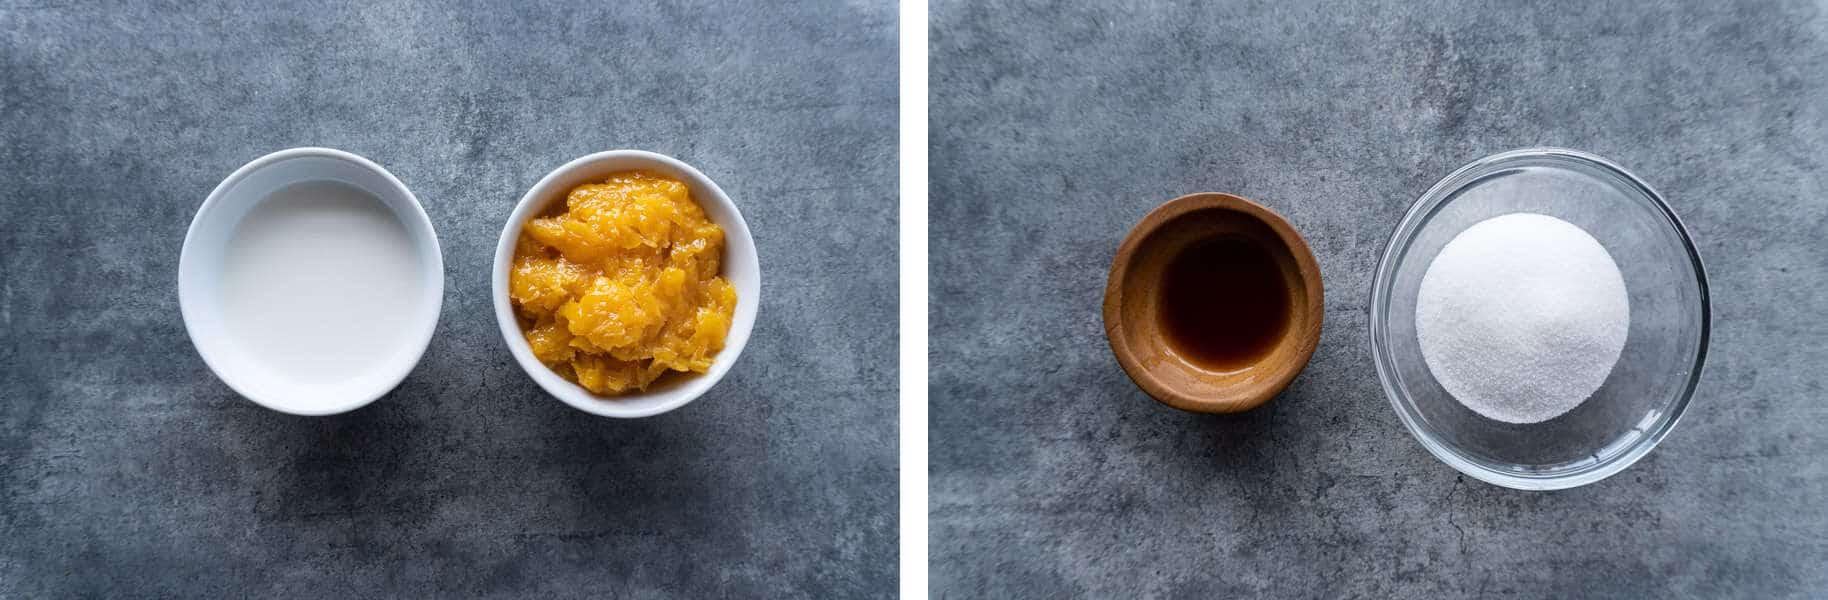 Orange Smoothie Ingredientrs